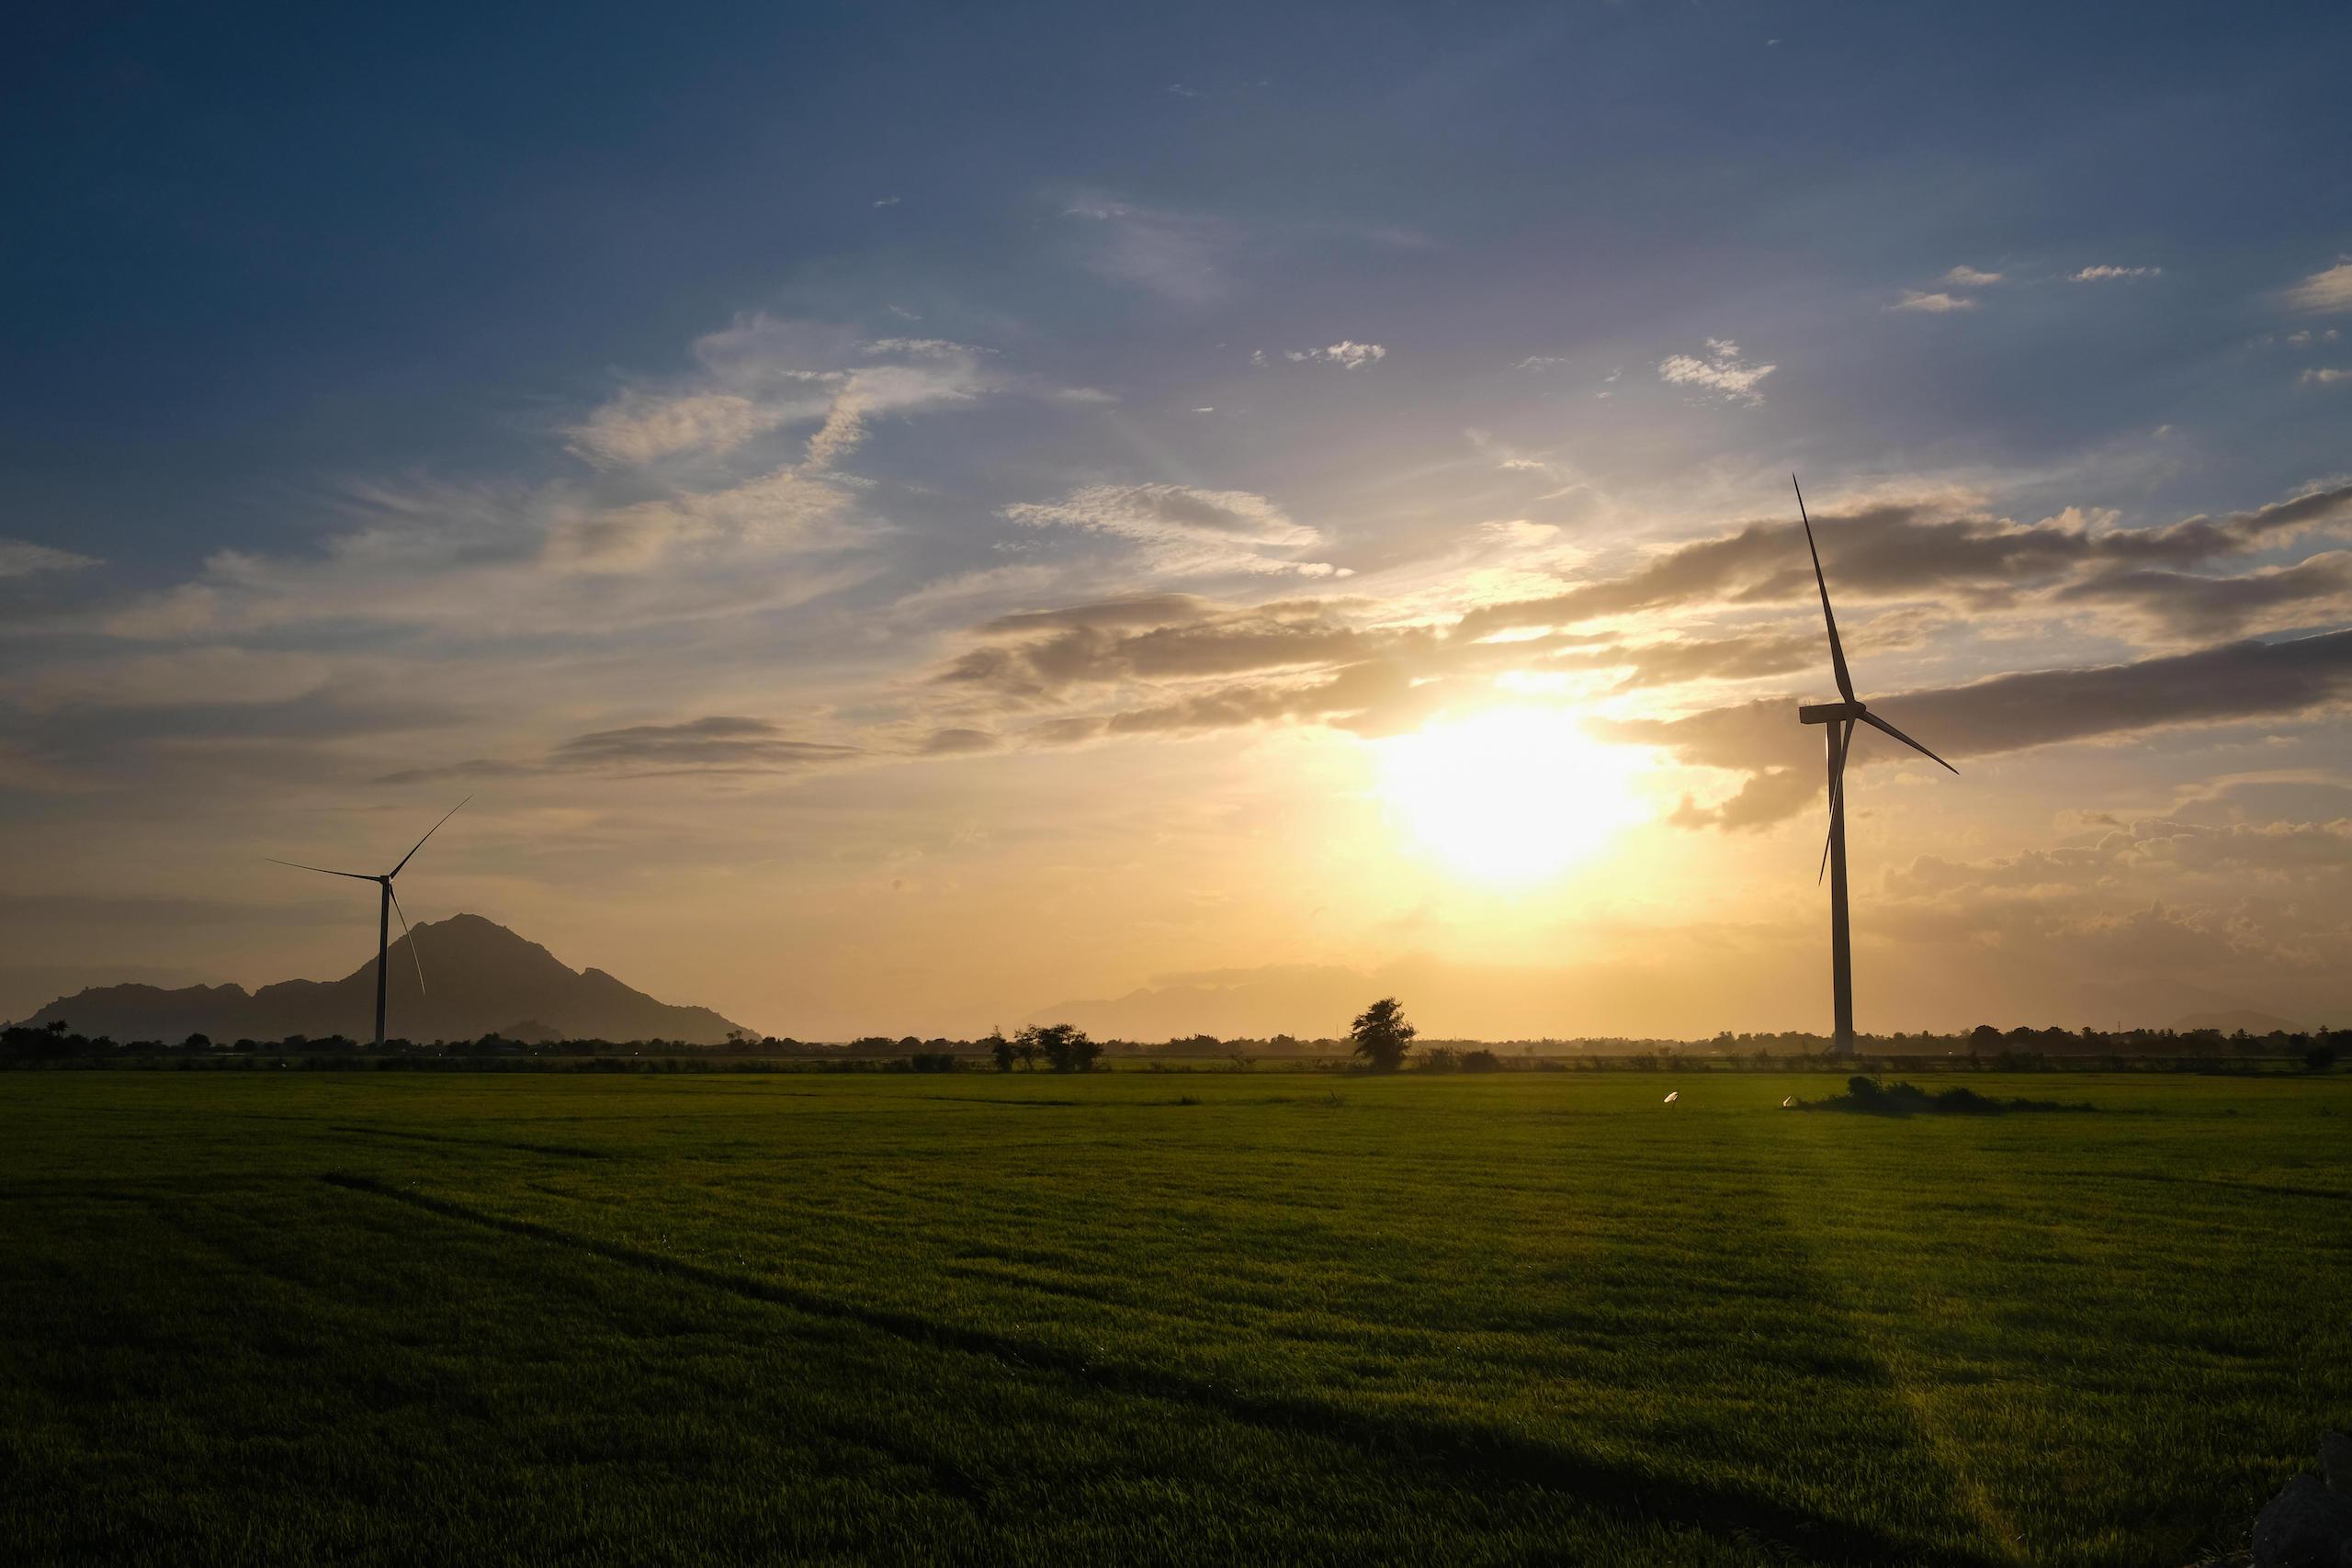 A wind farm in Vietnam